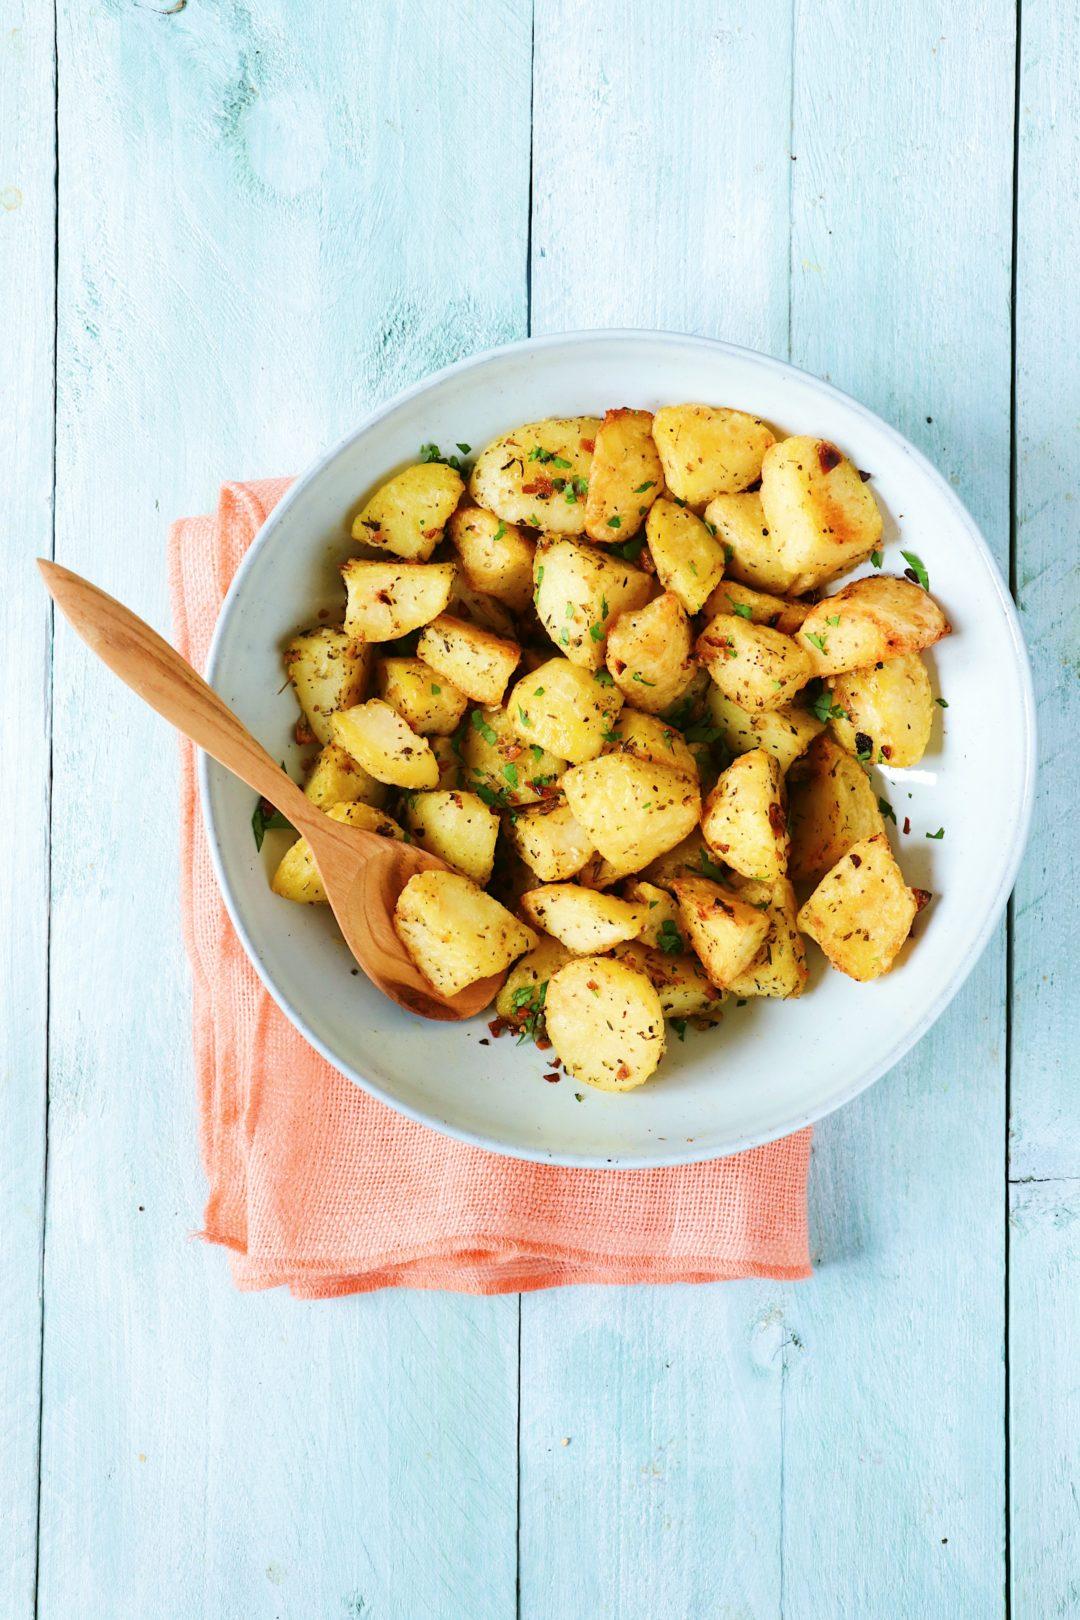 Recept geroosterde aardappeltjes www.jaimyskitchen.nl